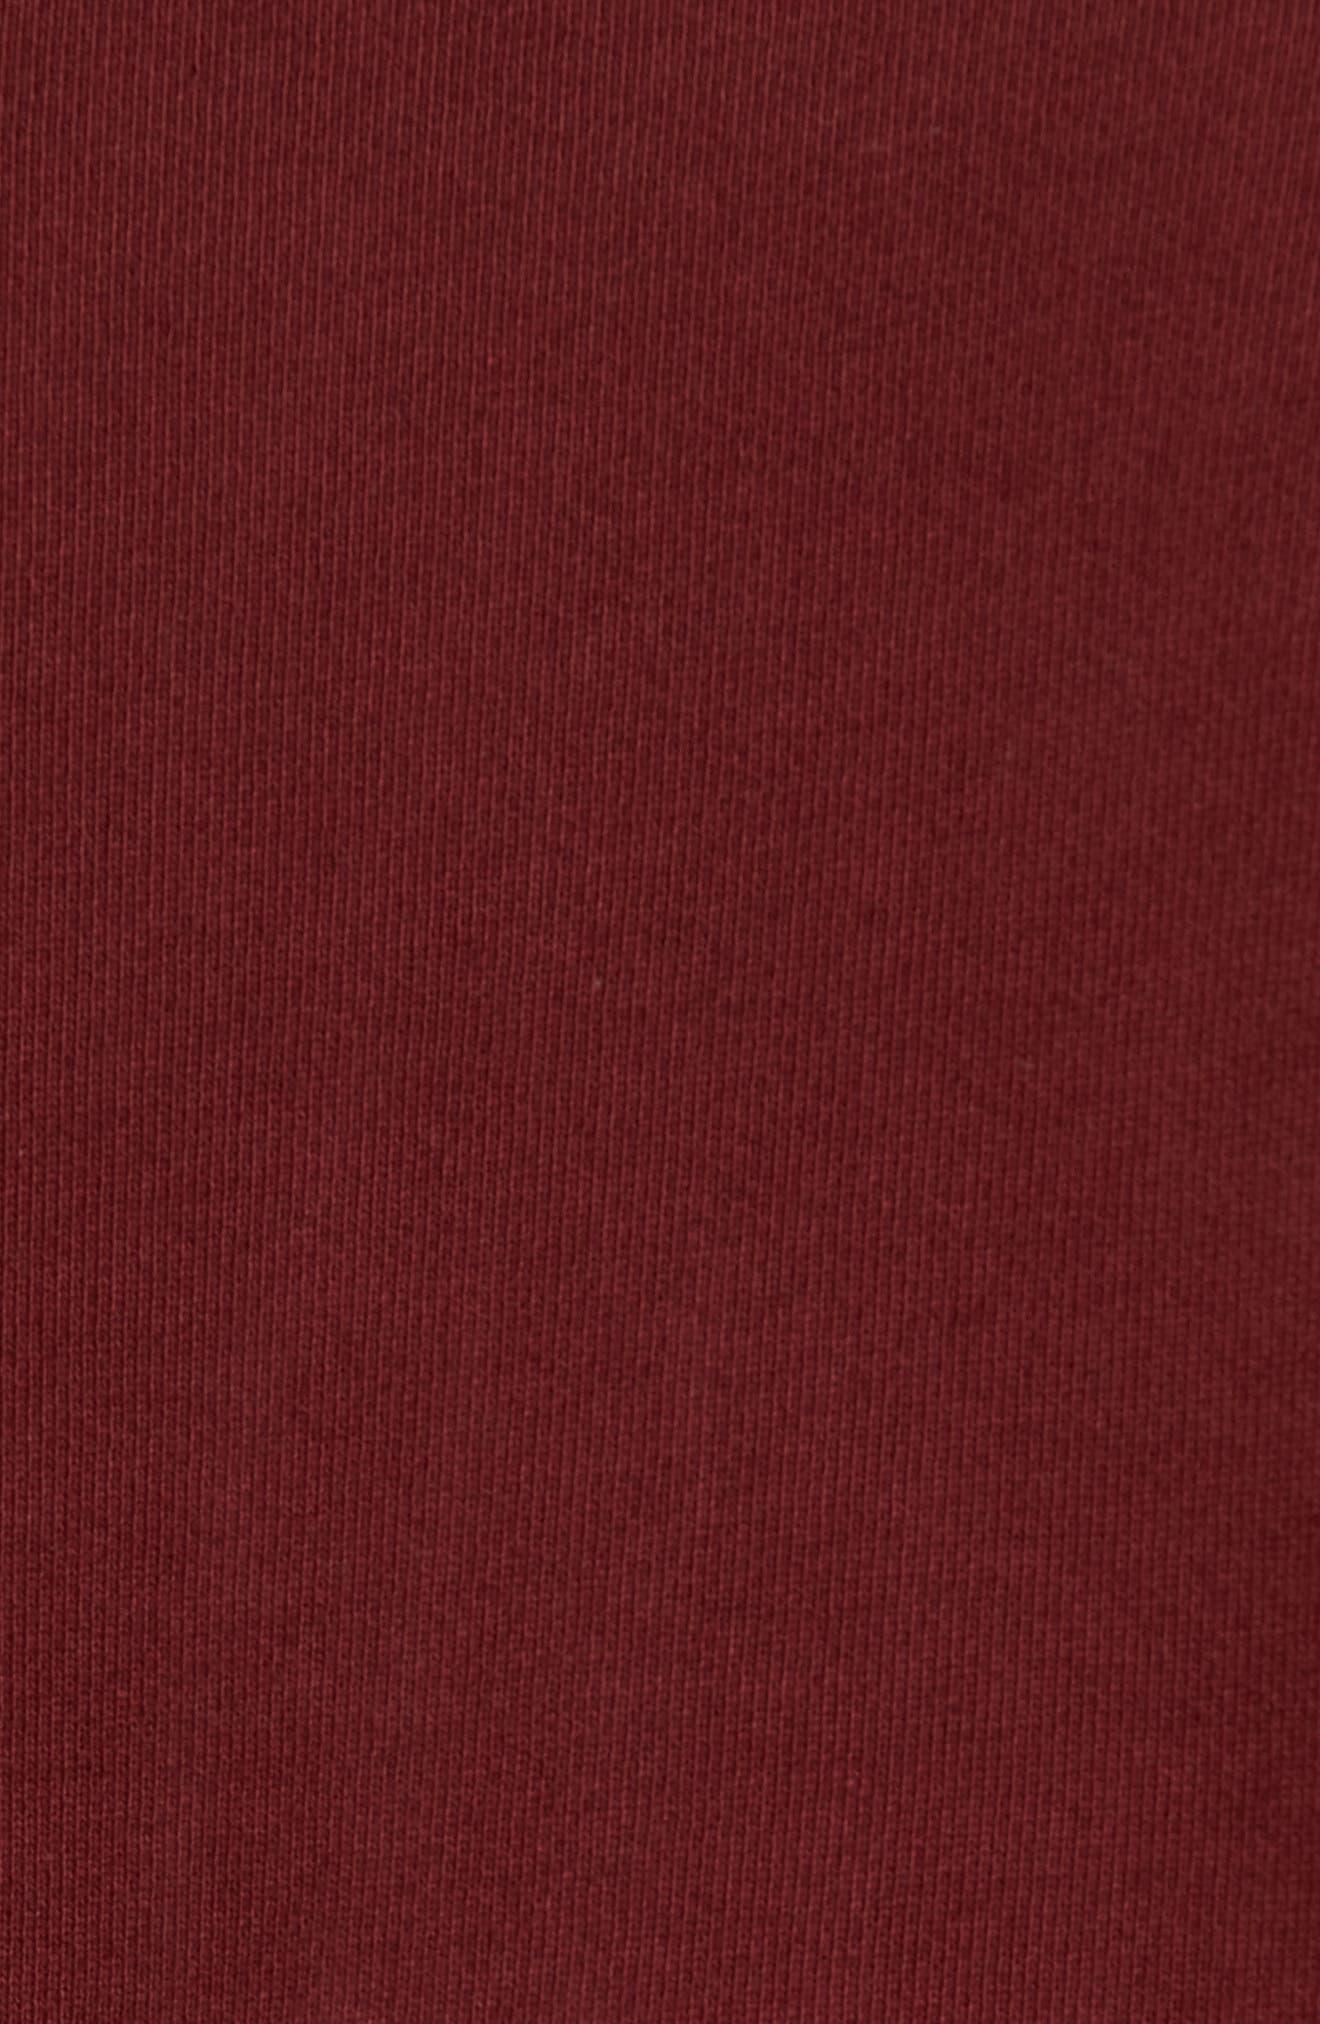 South Sea Raglan Sweatshirt,                             Alternate thumbnail 15, color,